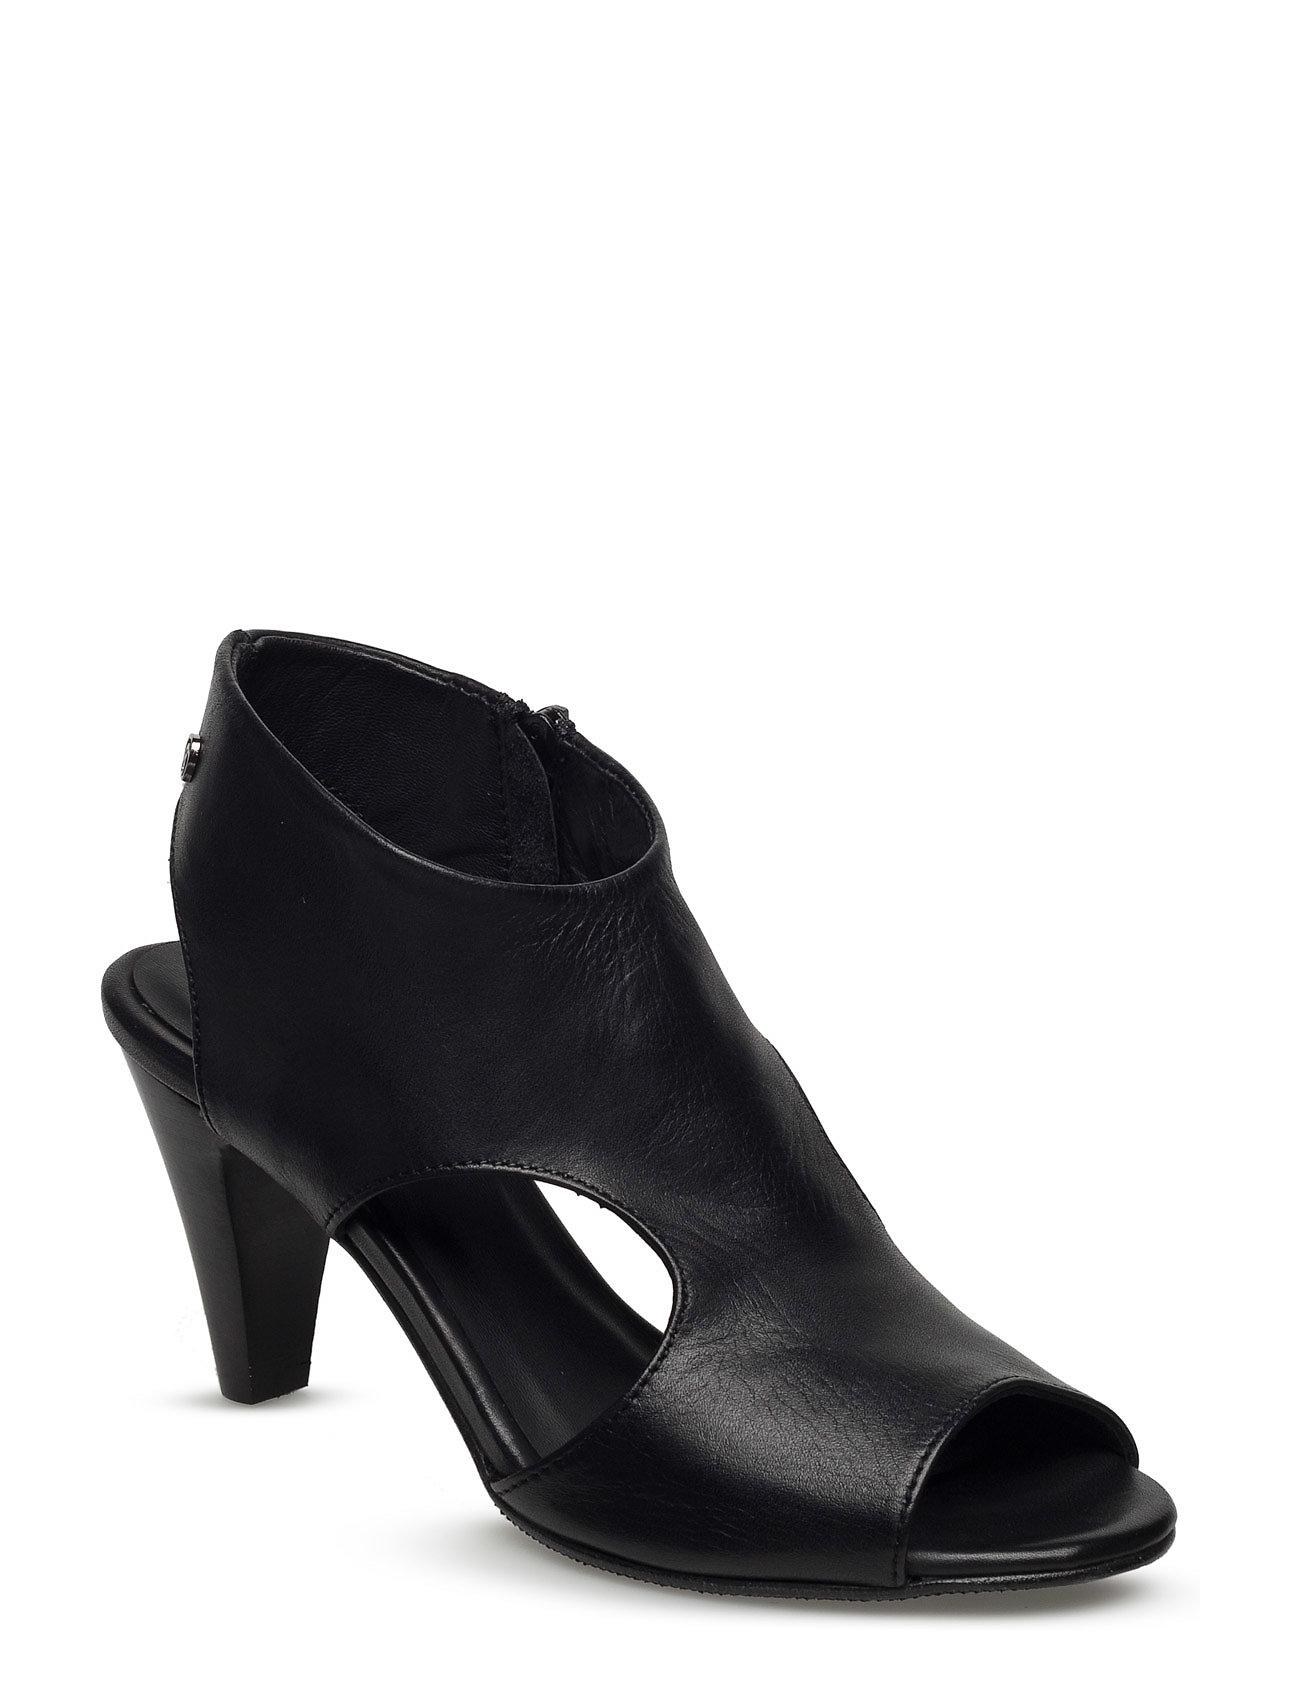 Shoes, High Heel Rosemunde Sandaler til Damer i Sort